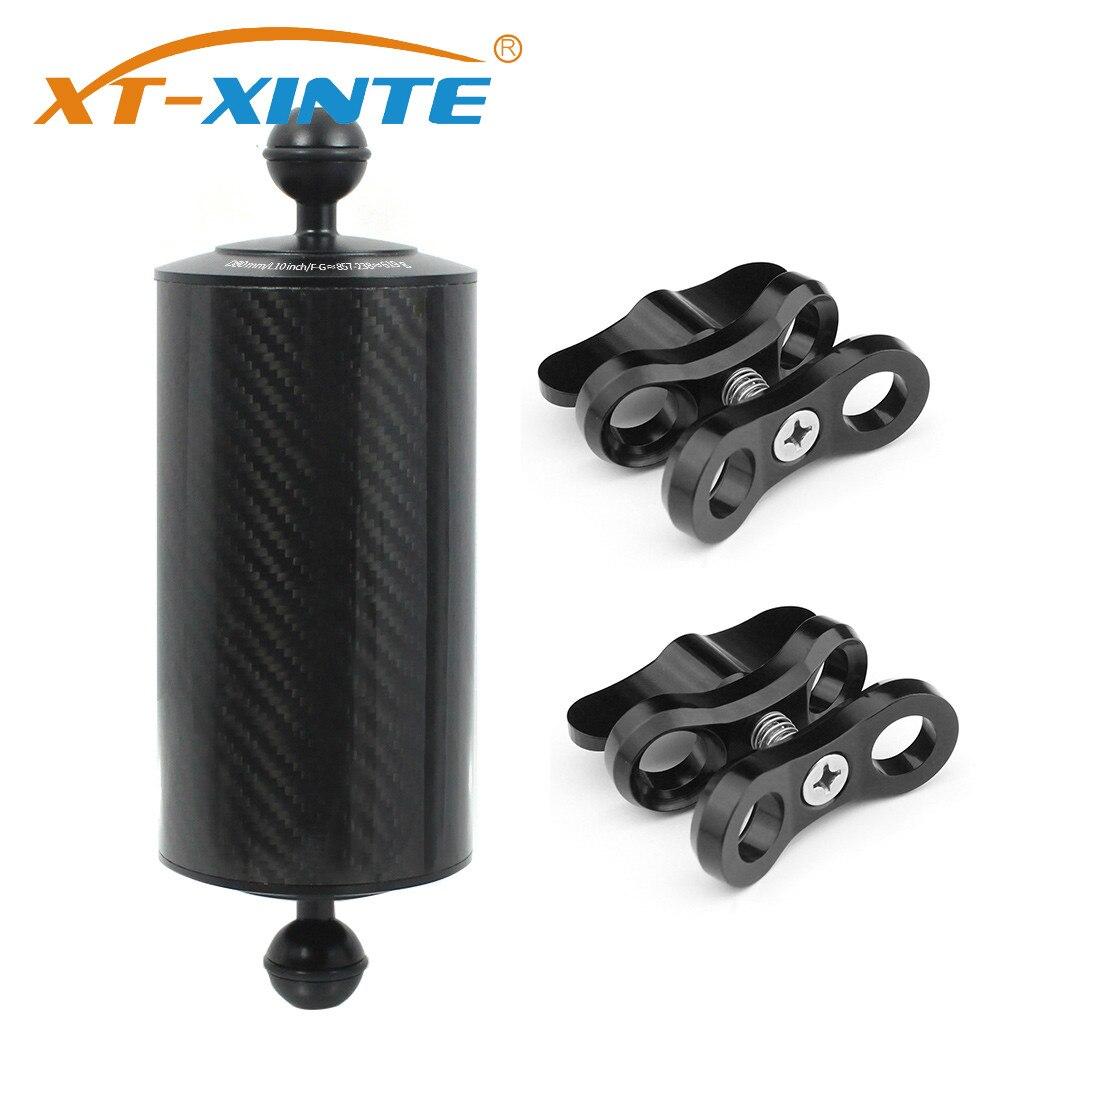 XT-XINTE fibra de carbono de doble flotabilidad de bola de flotador acuático D80mm 5/8/10 pulgadas de buceo SLR cámara de luz bandeja de 1 pulgada Clip de batería